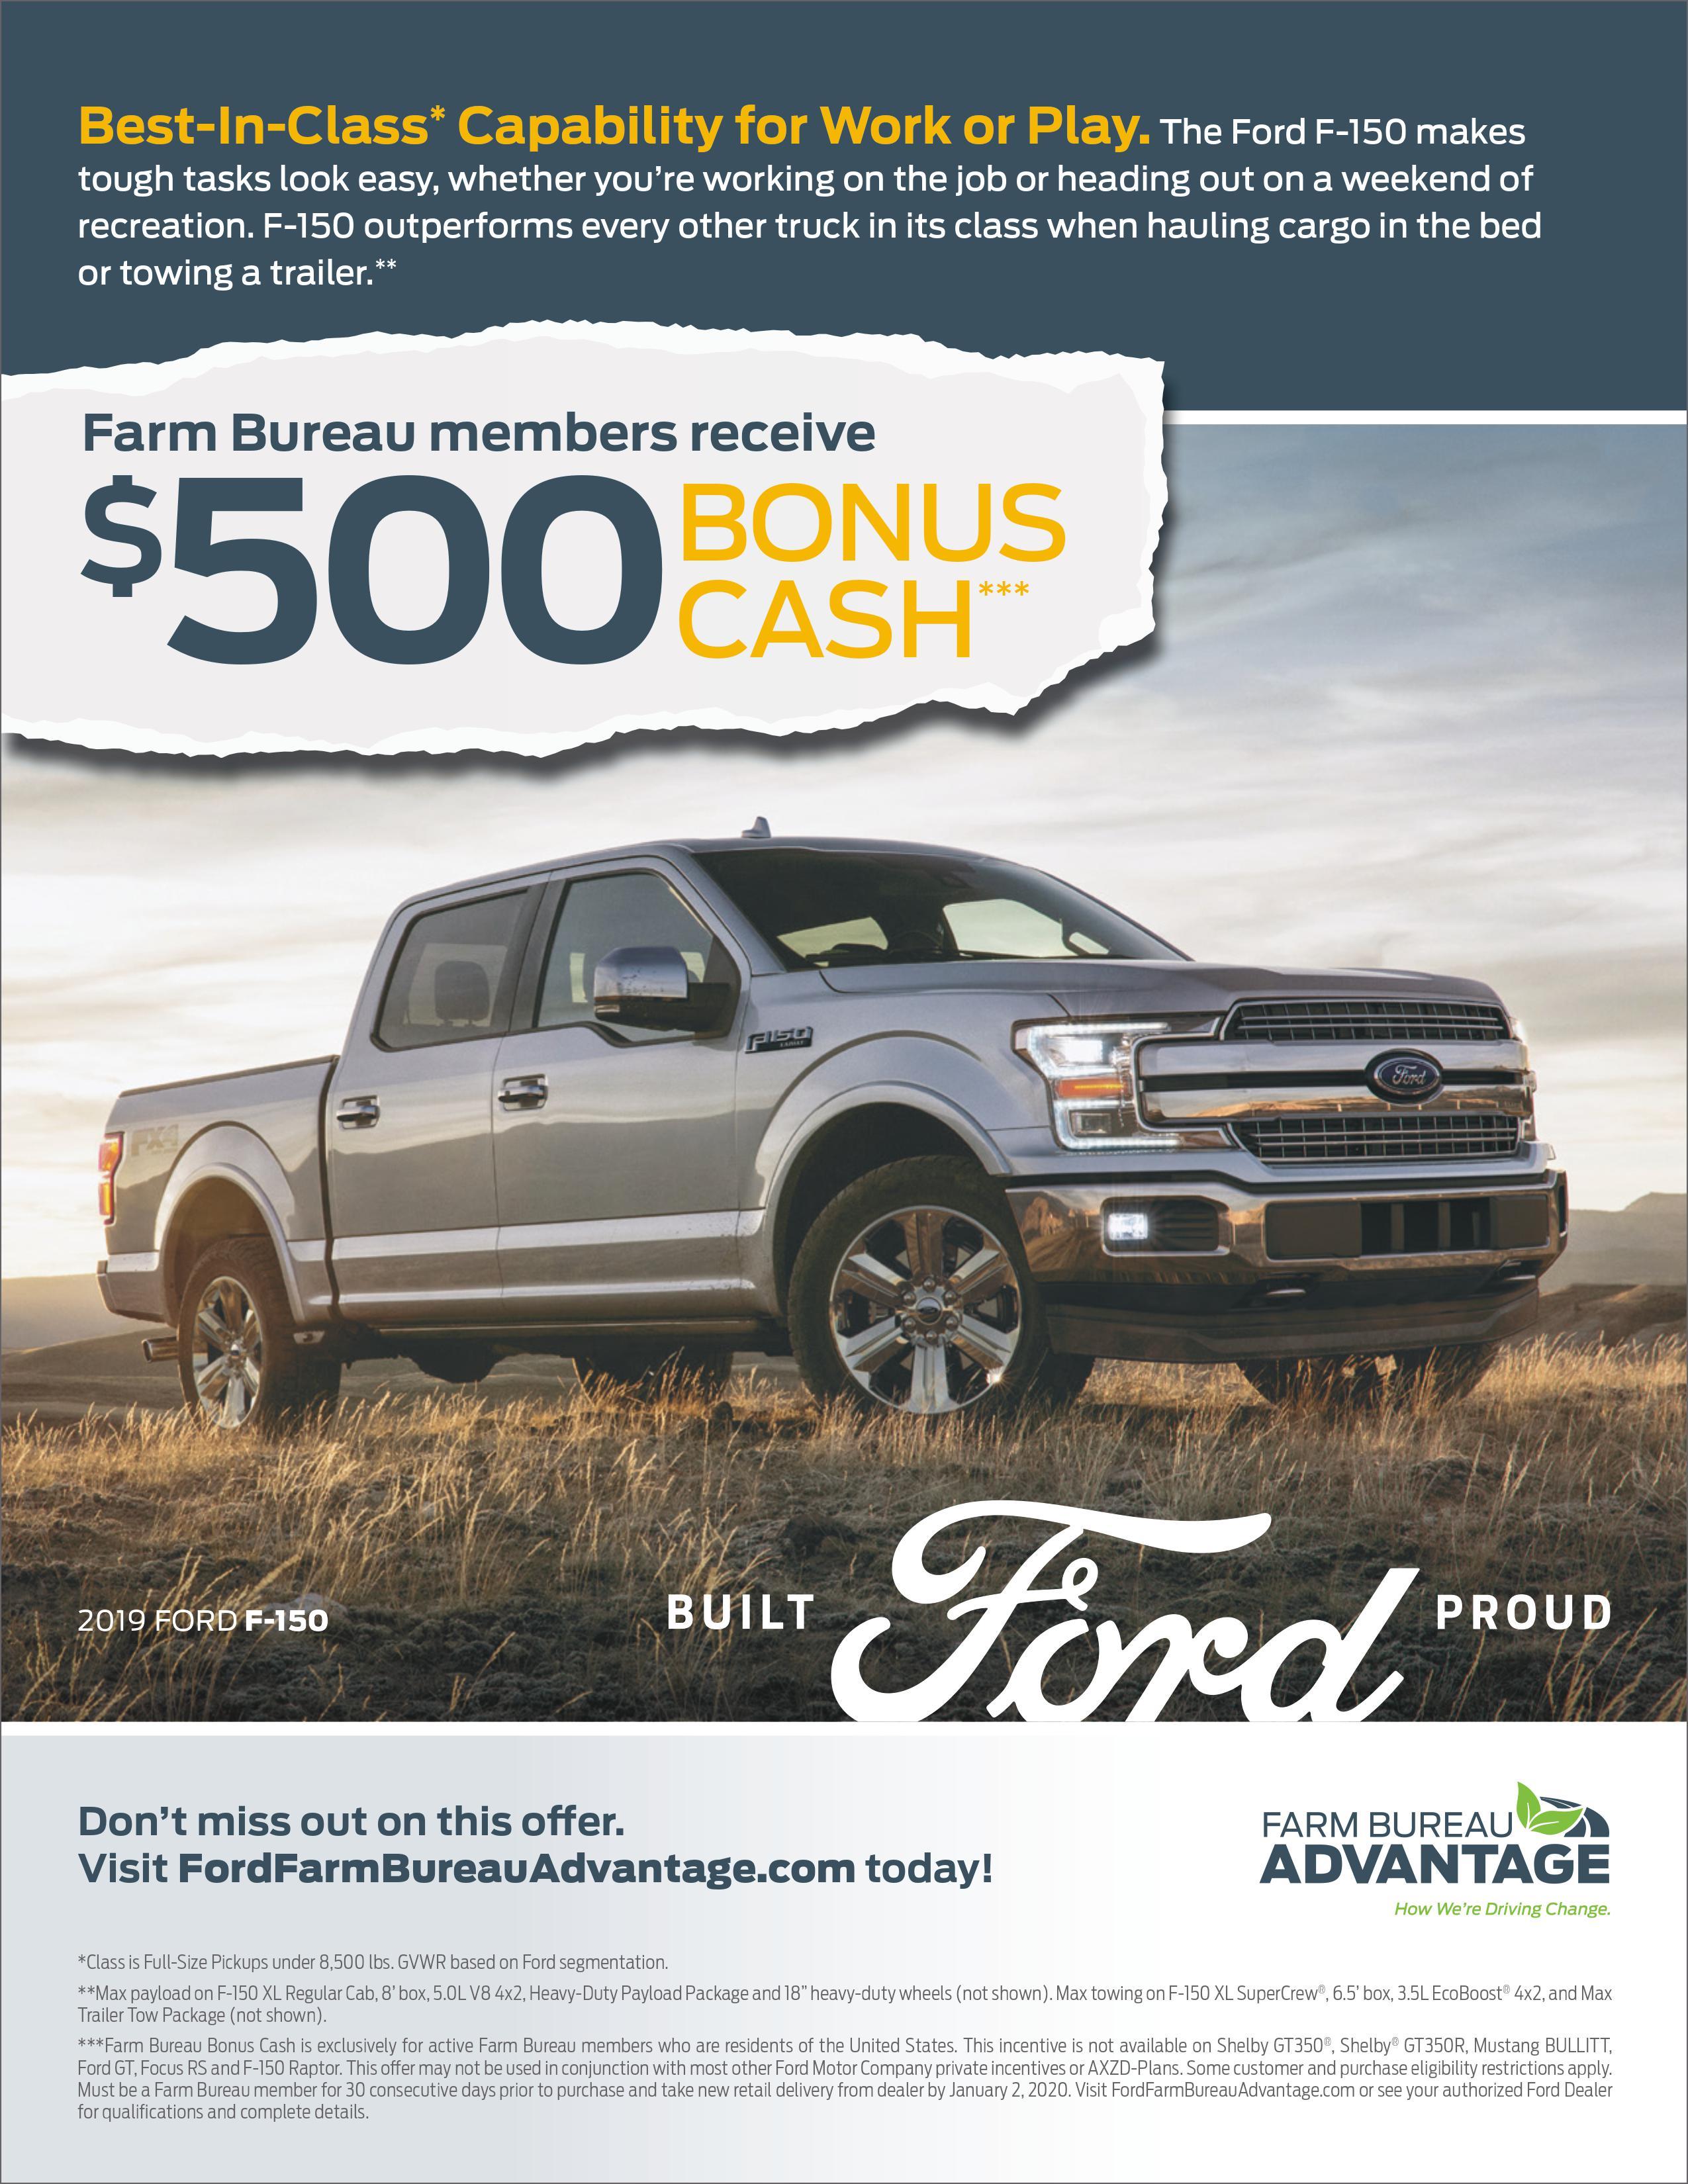 Ford $500 Bonus Cash – Rhode Island Farm Bureau